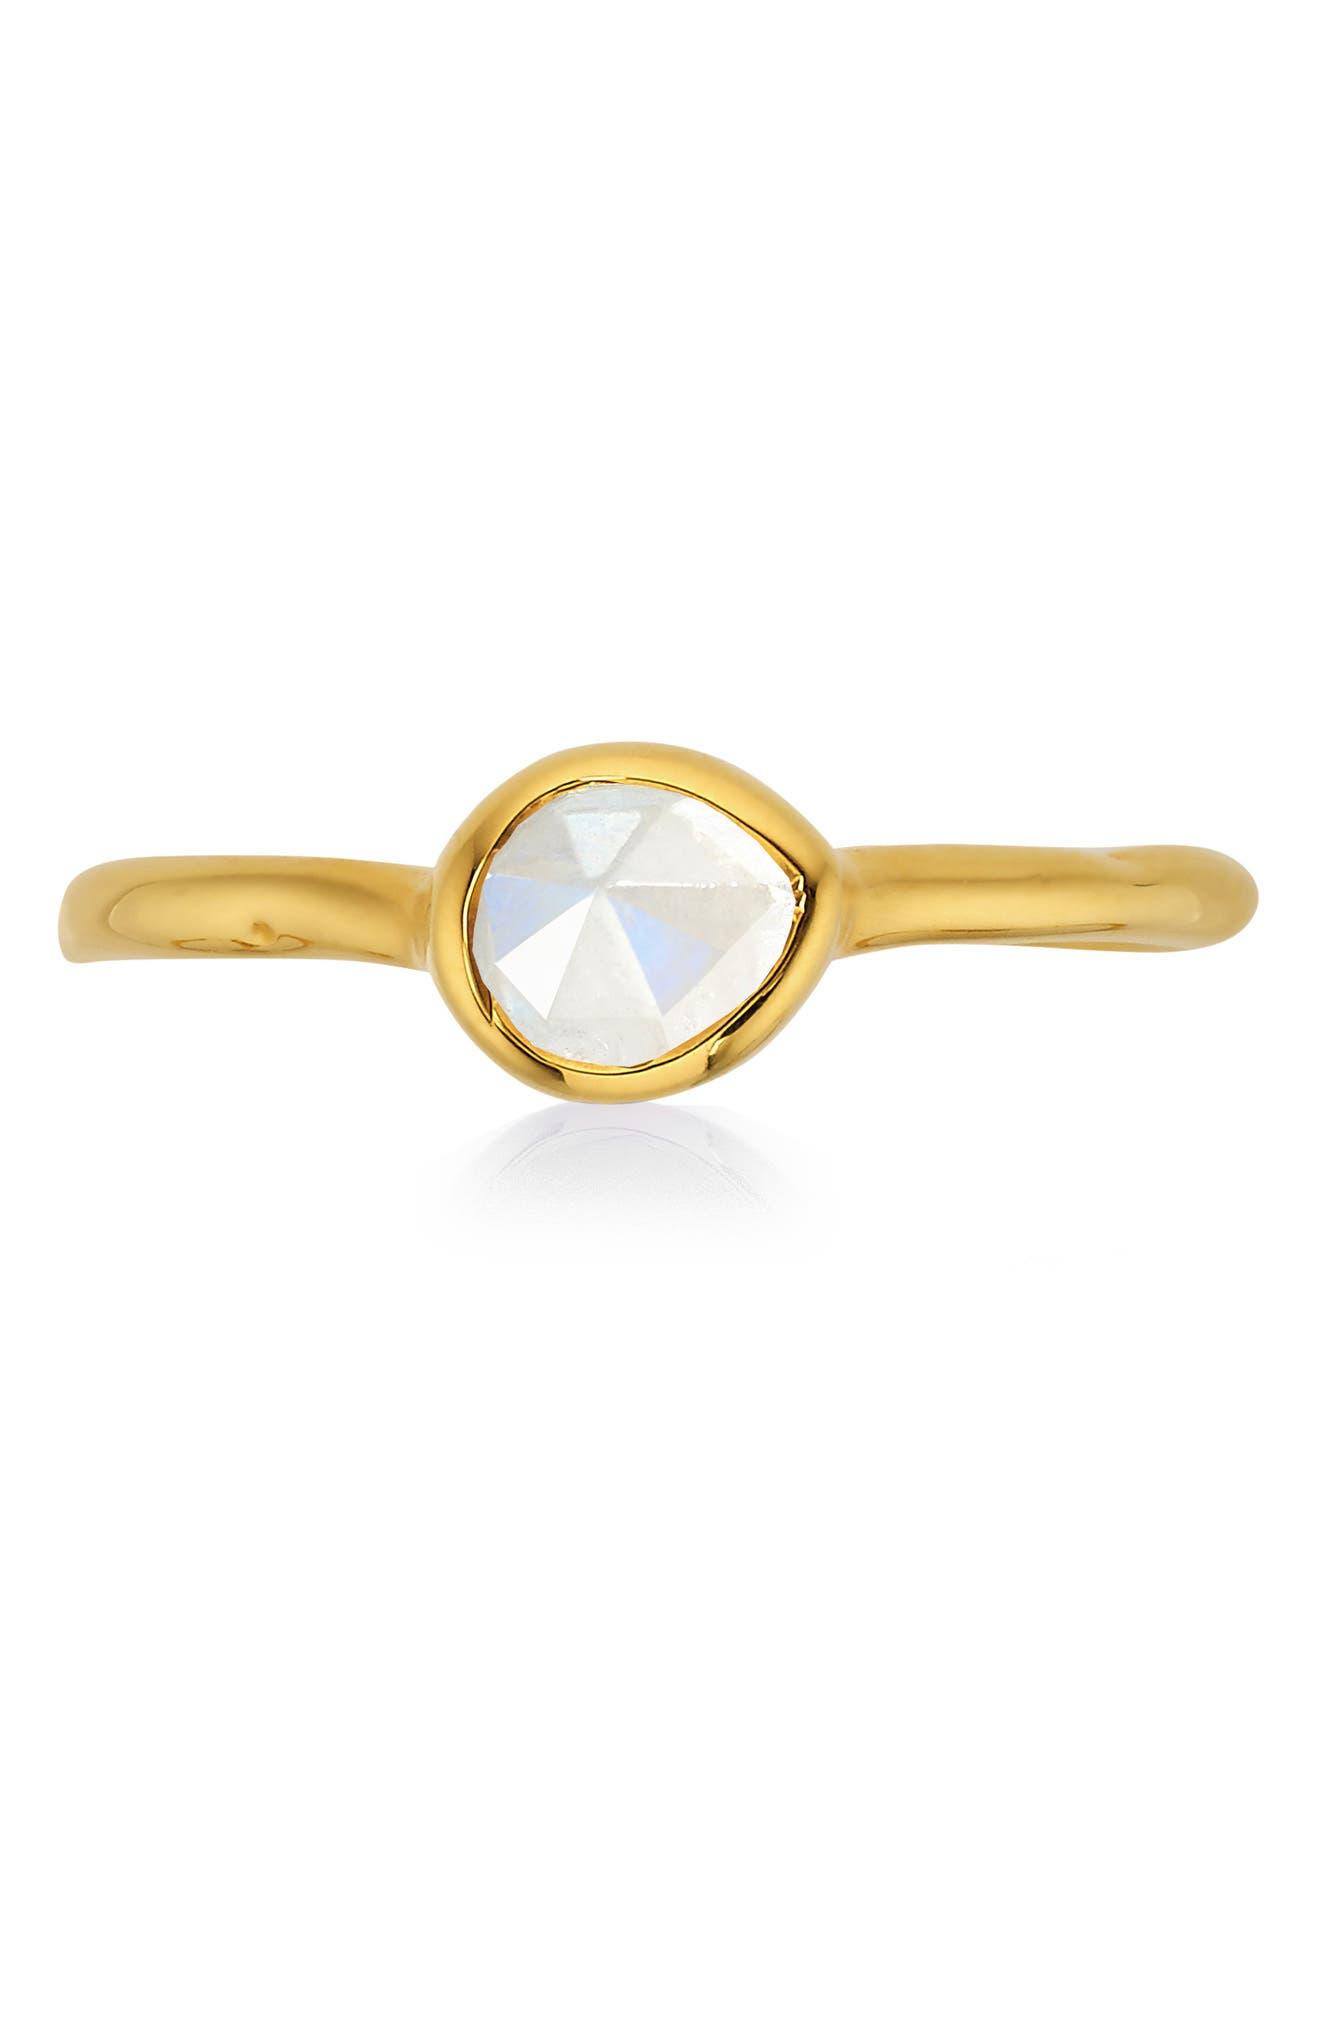 MONICA VINADER, Siren Small Semiprecious Stone Stacking Ring, Alternate thumbnail 4, color, GOLD/ MOONSTONE